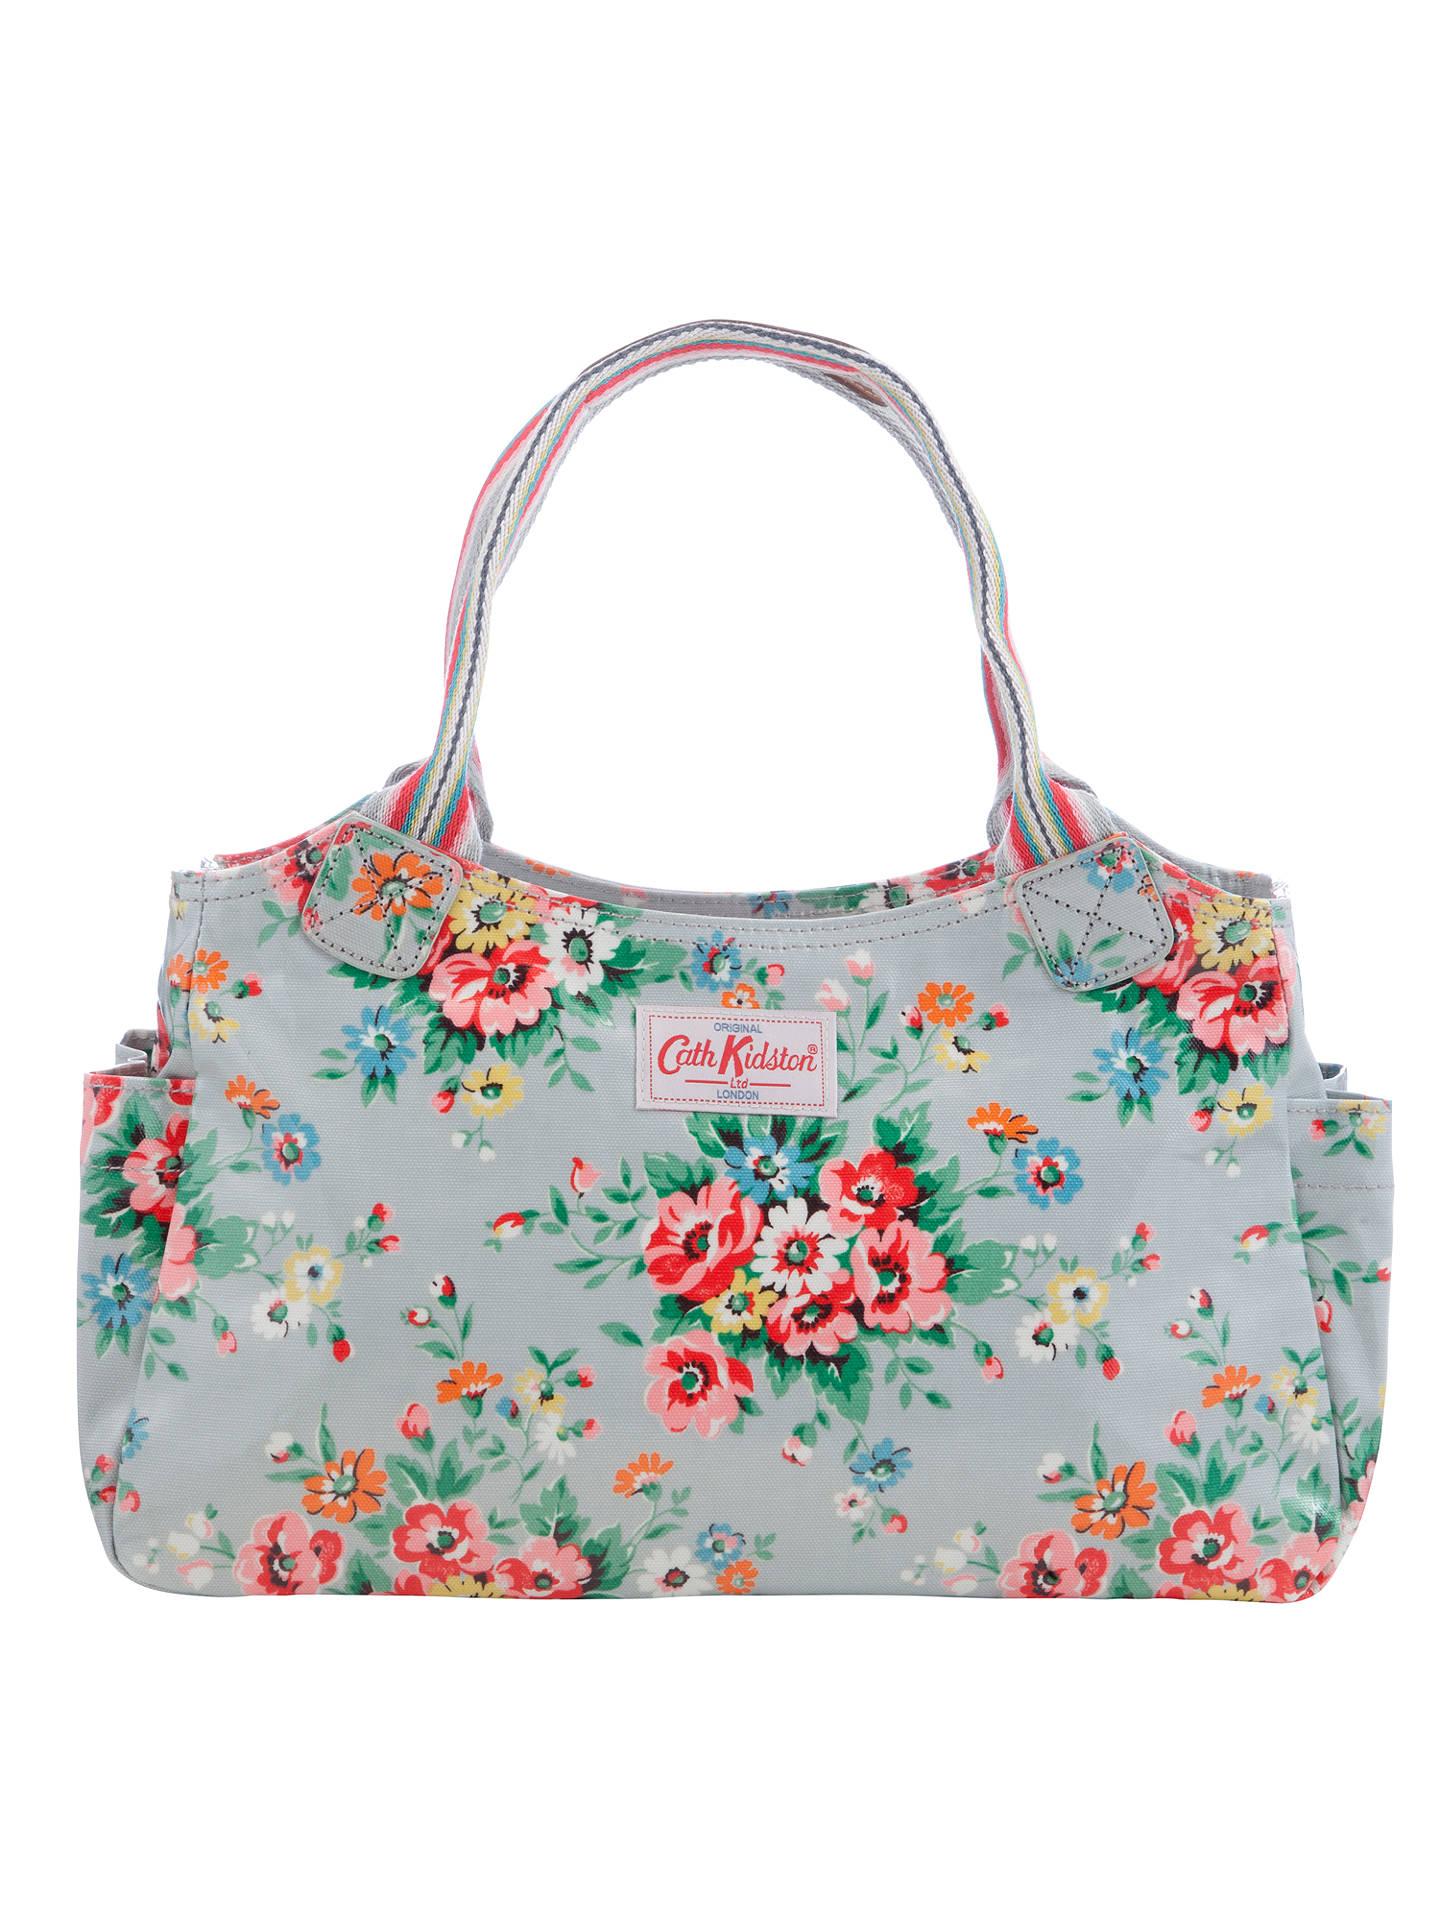 bcab13fbc6 Buy Cath Kidston Day Bag